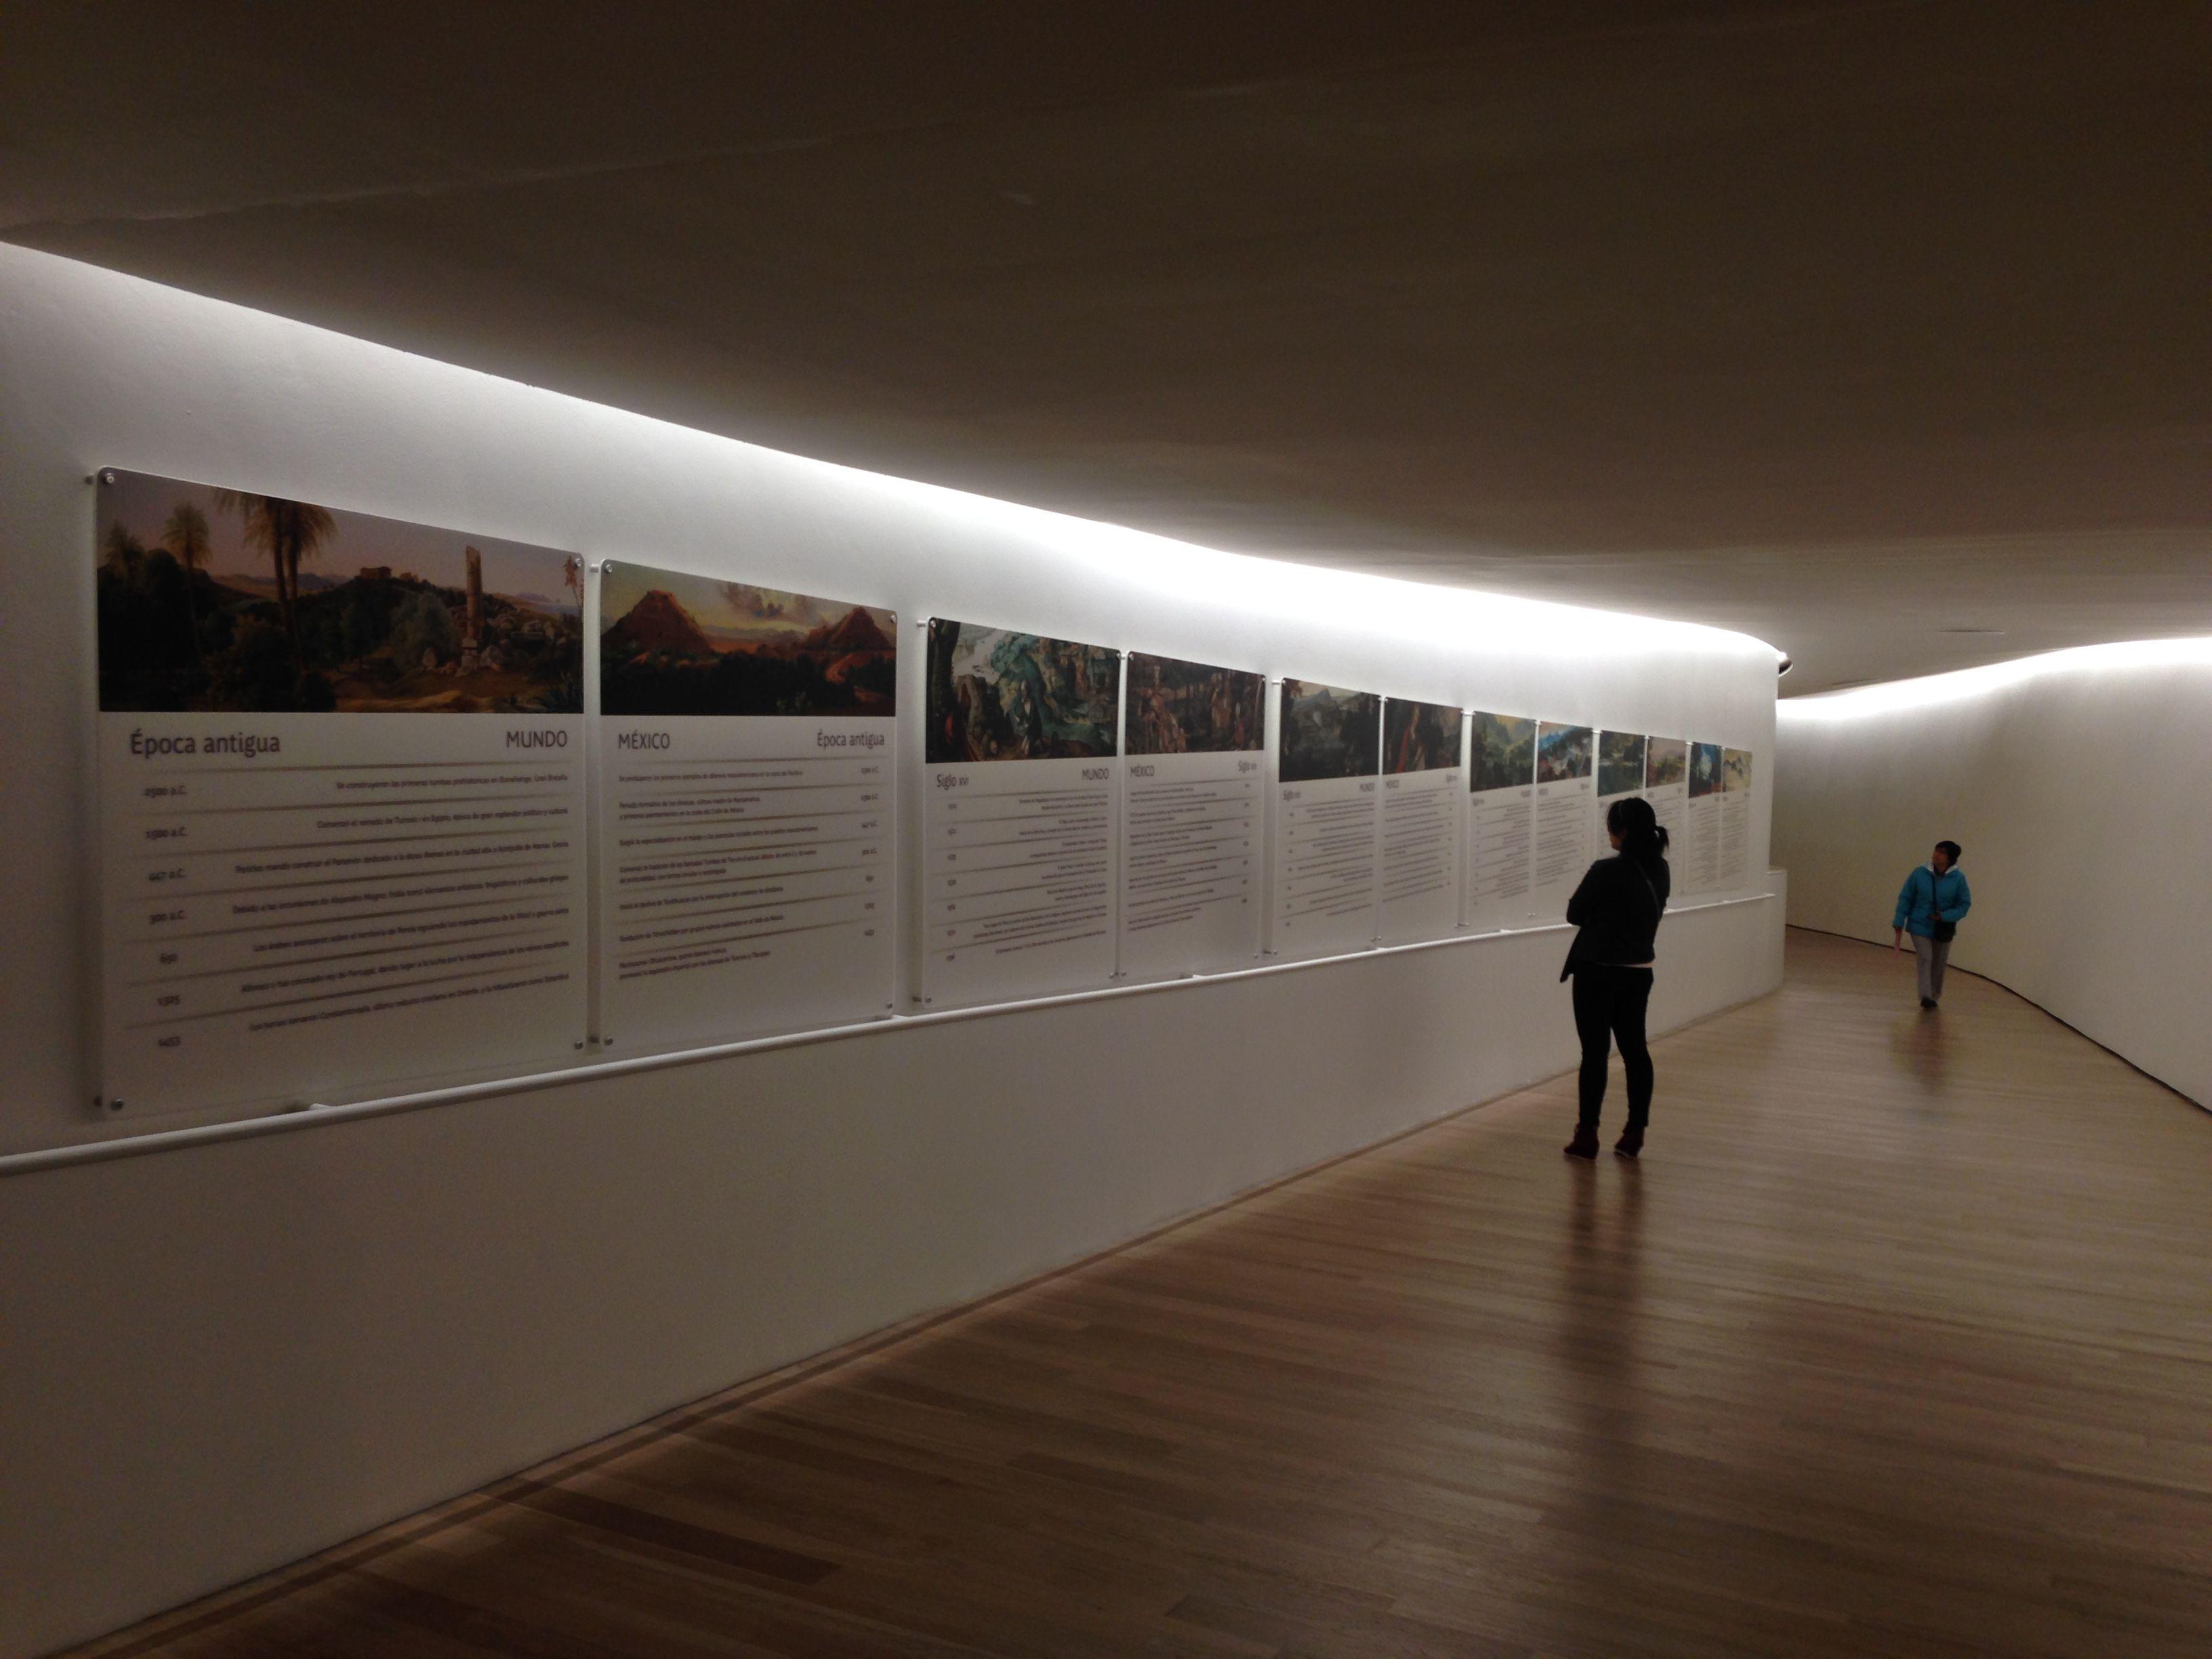 #museo #pintura #escultura #MuseoSoumaya